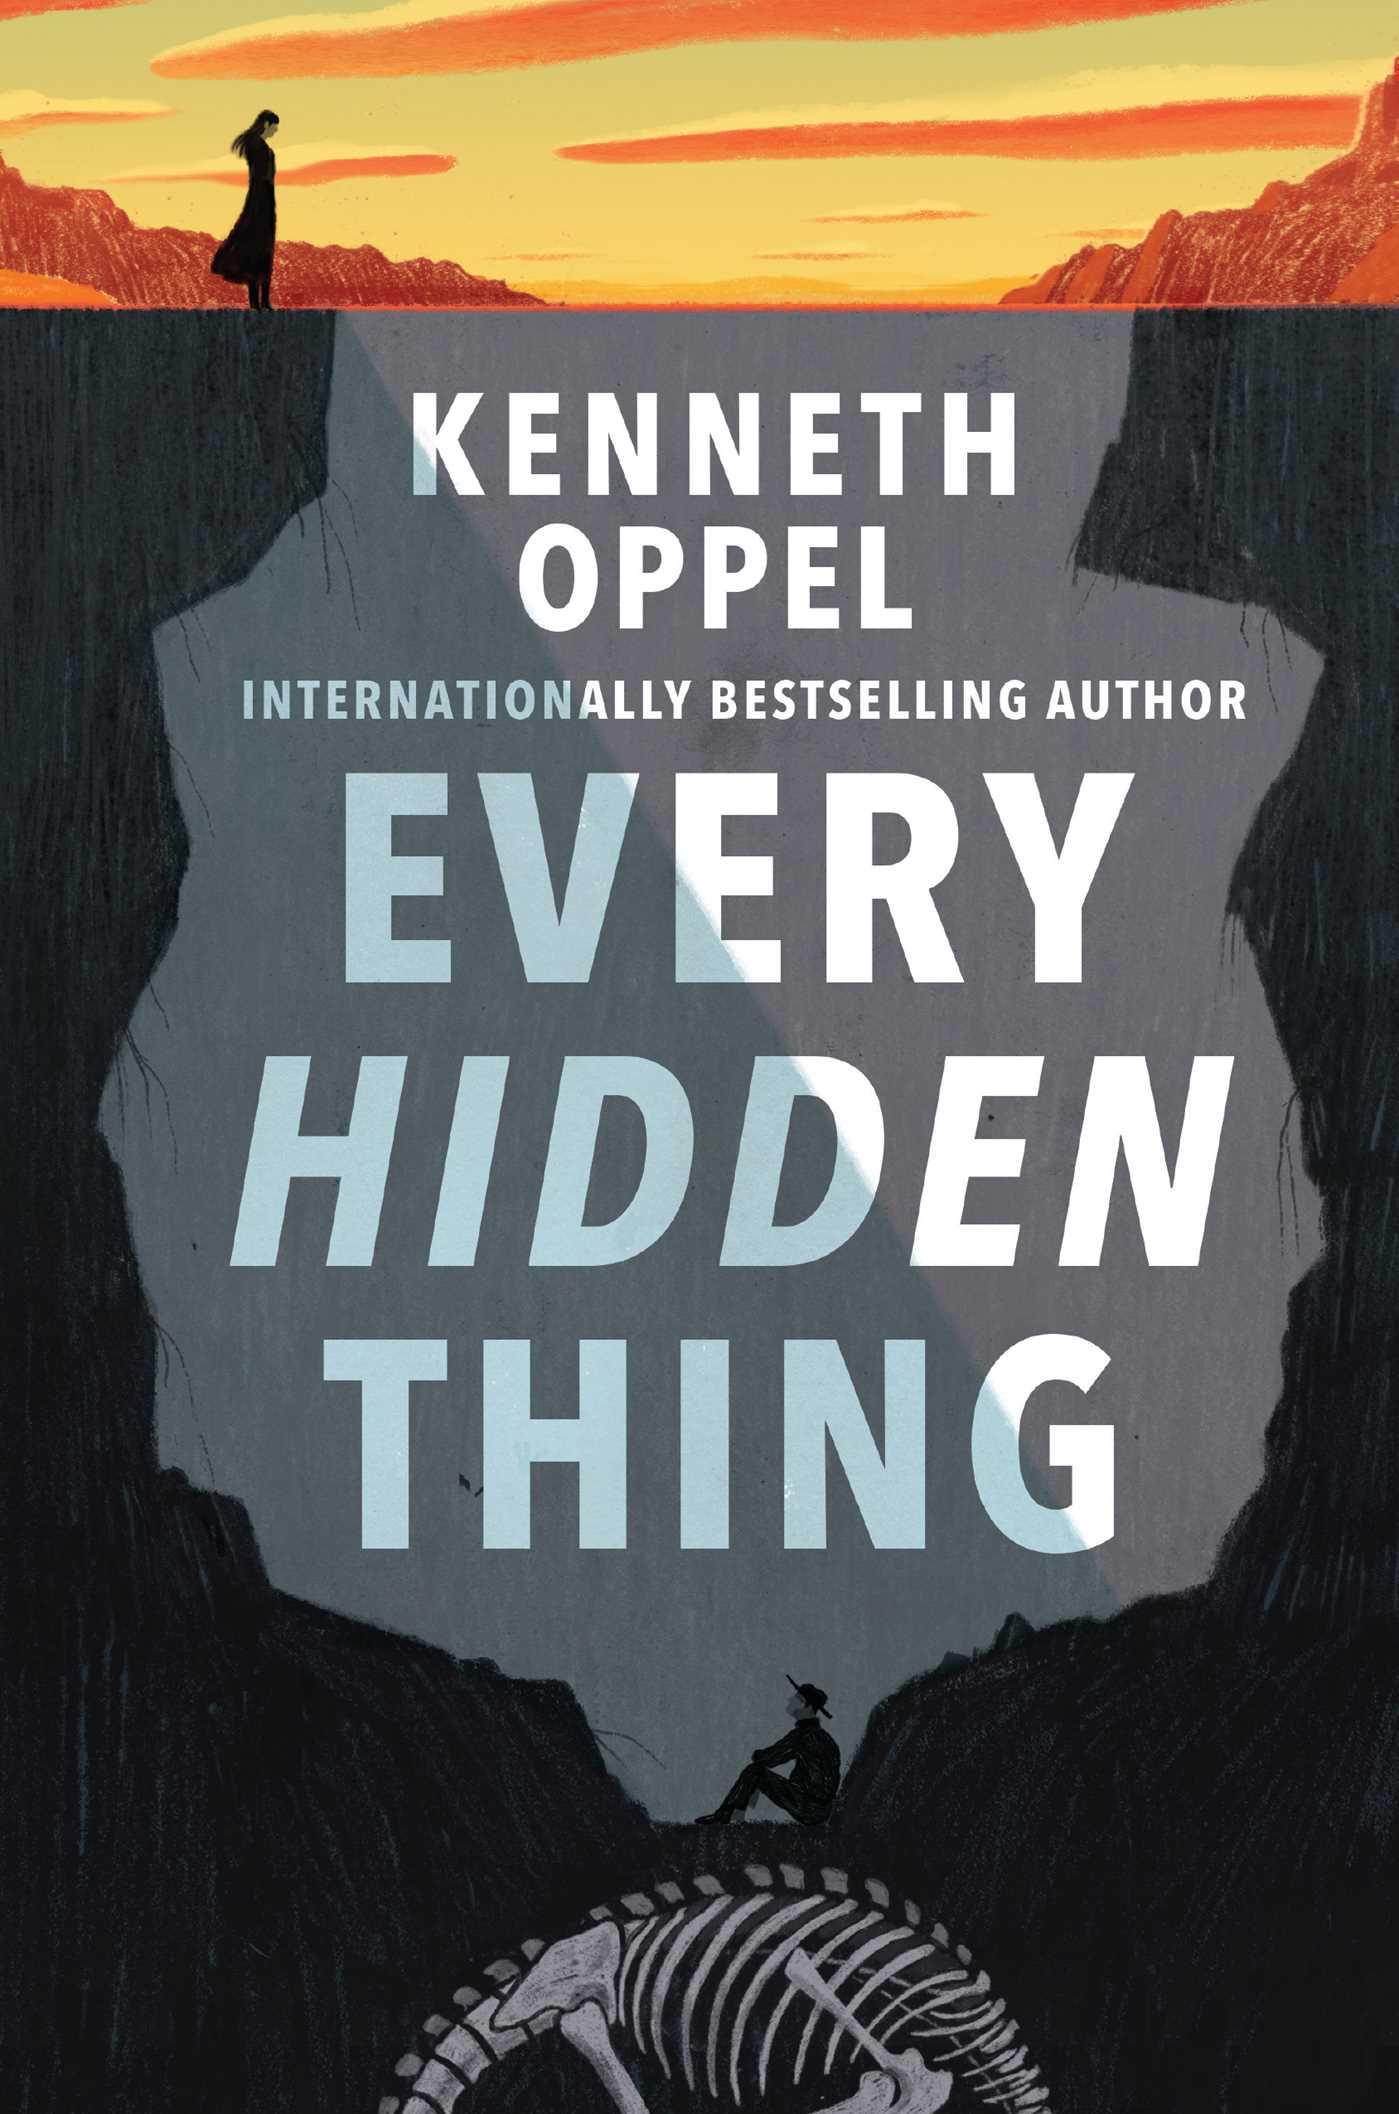 Every hidden thing 9781481464185 hr